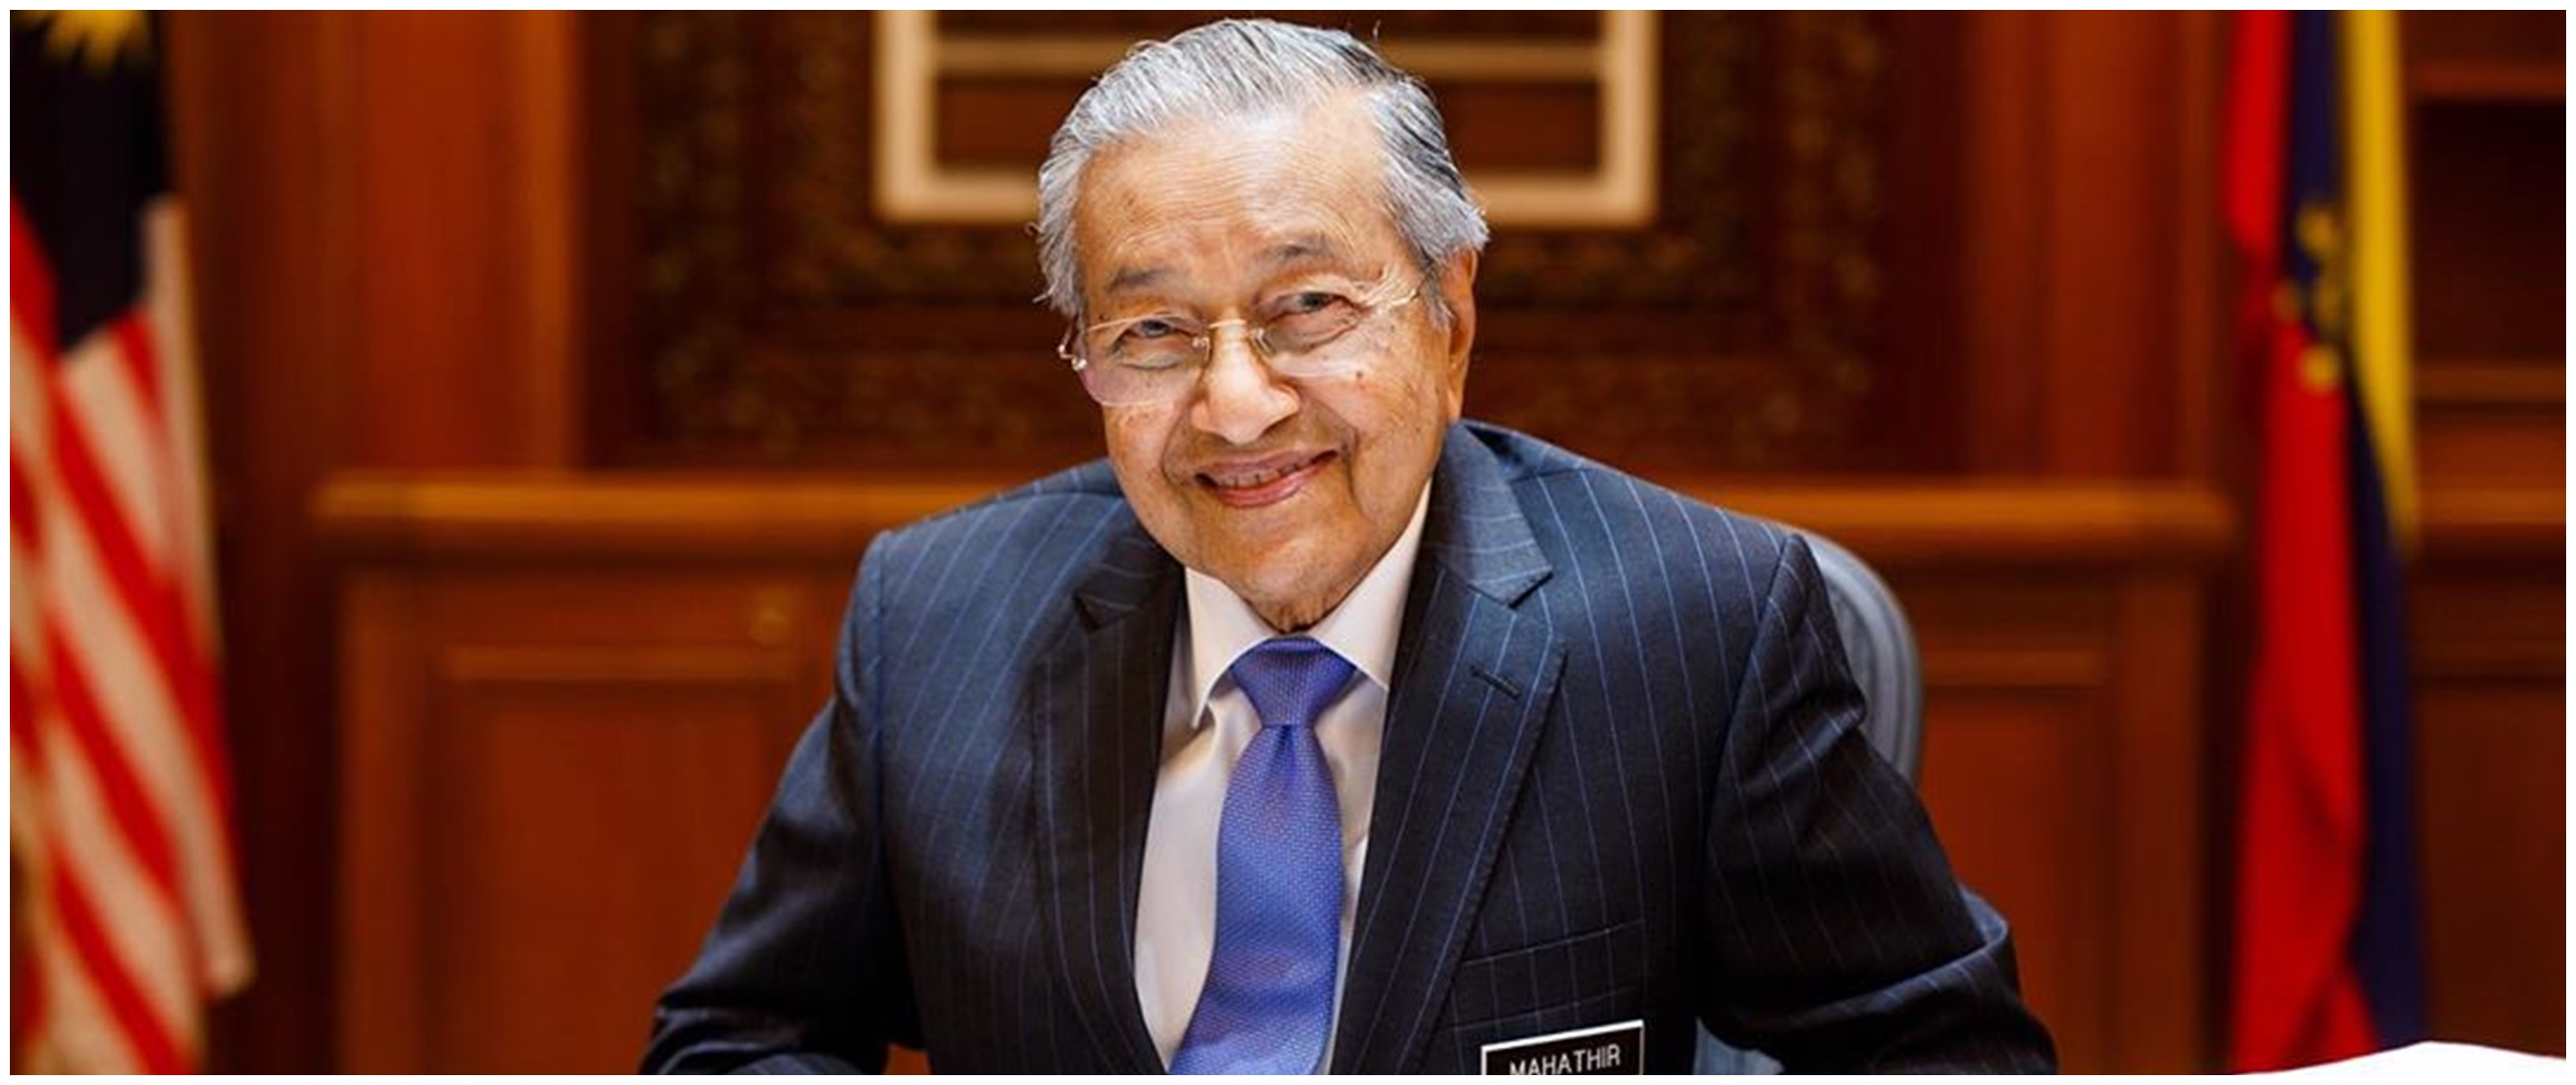 Mahathir Mohamad mundur jadi perdana menteri Malaysia